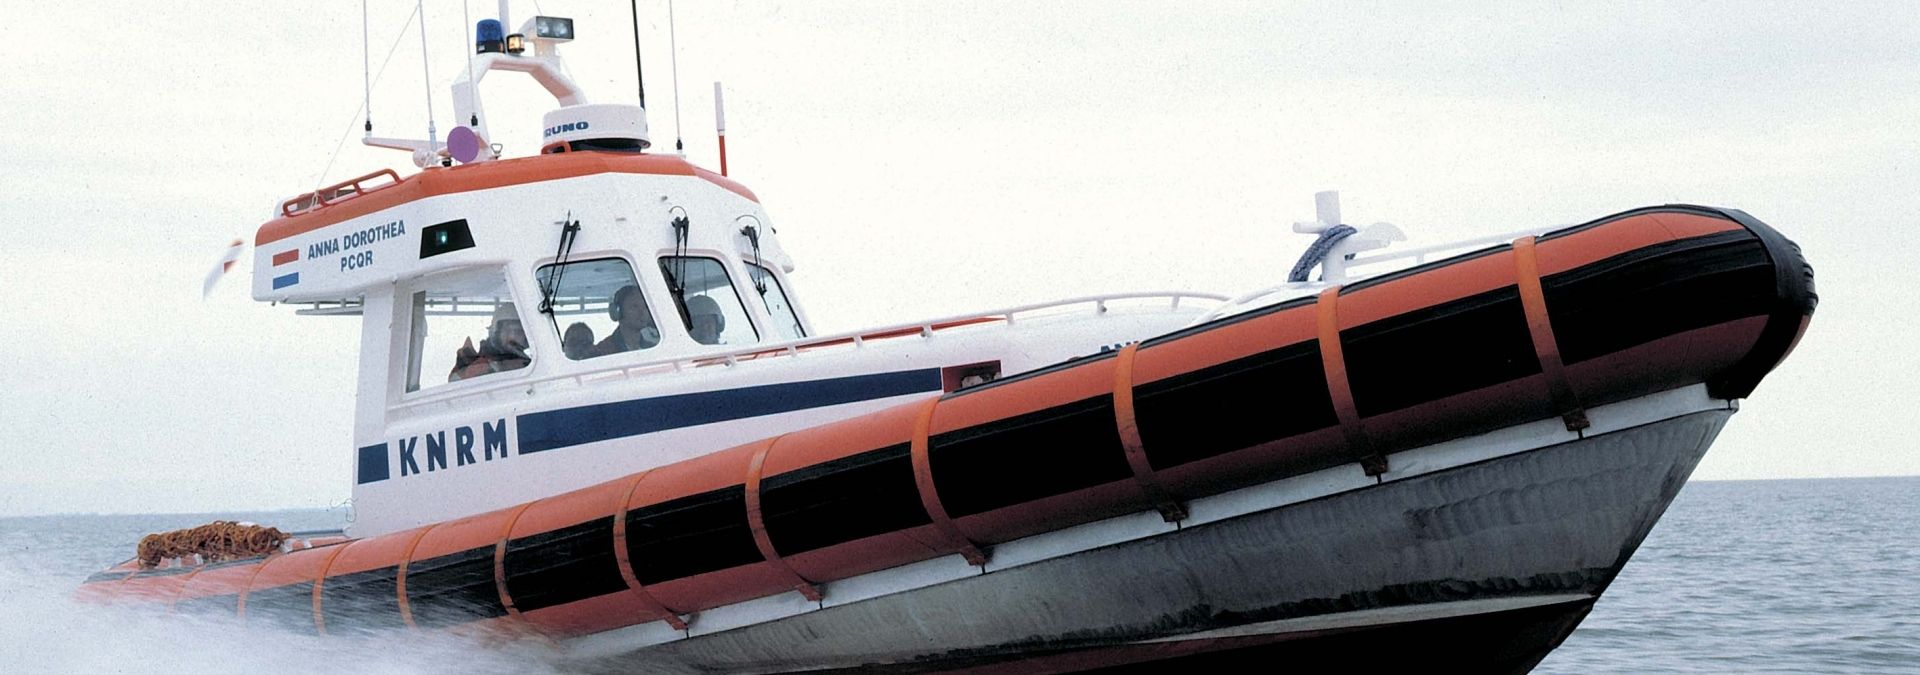 Reddingboot Anna Dorothea